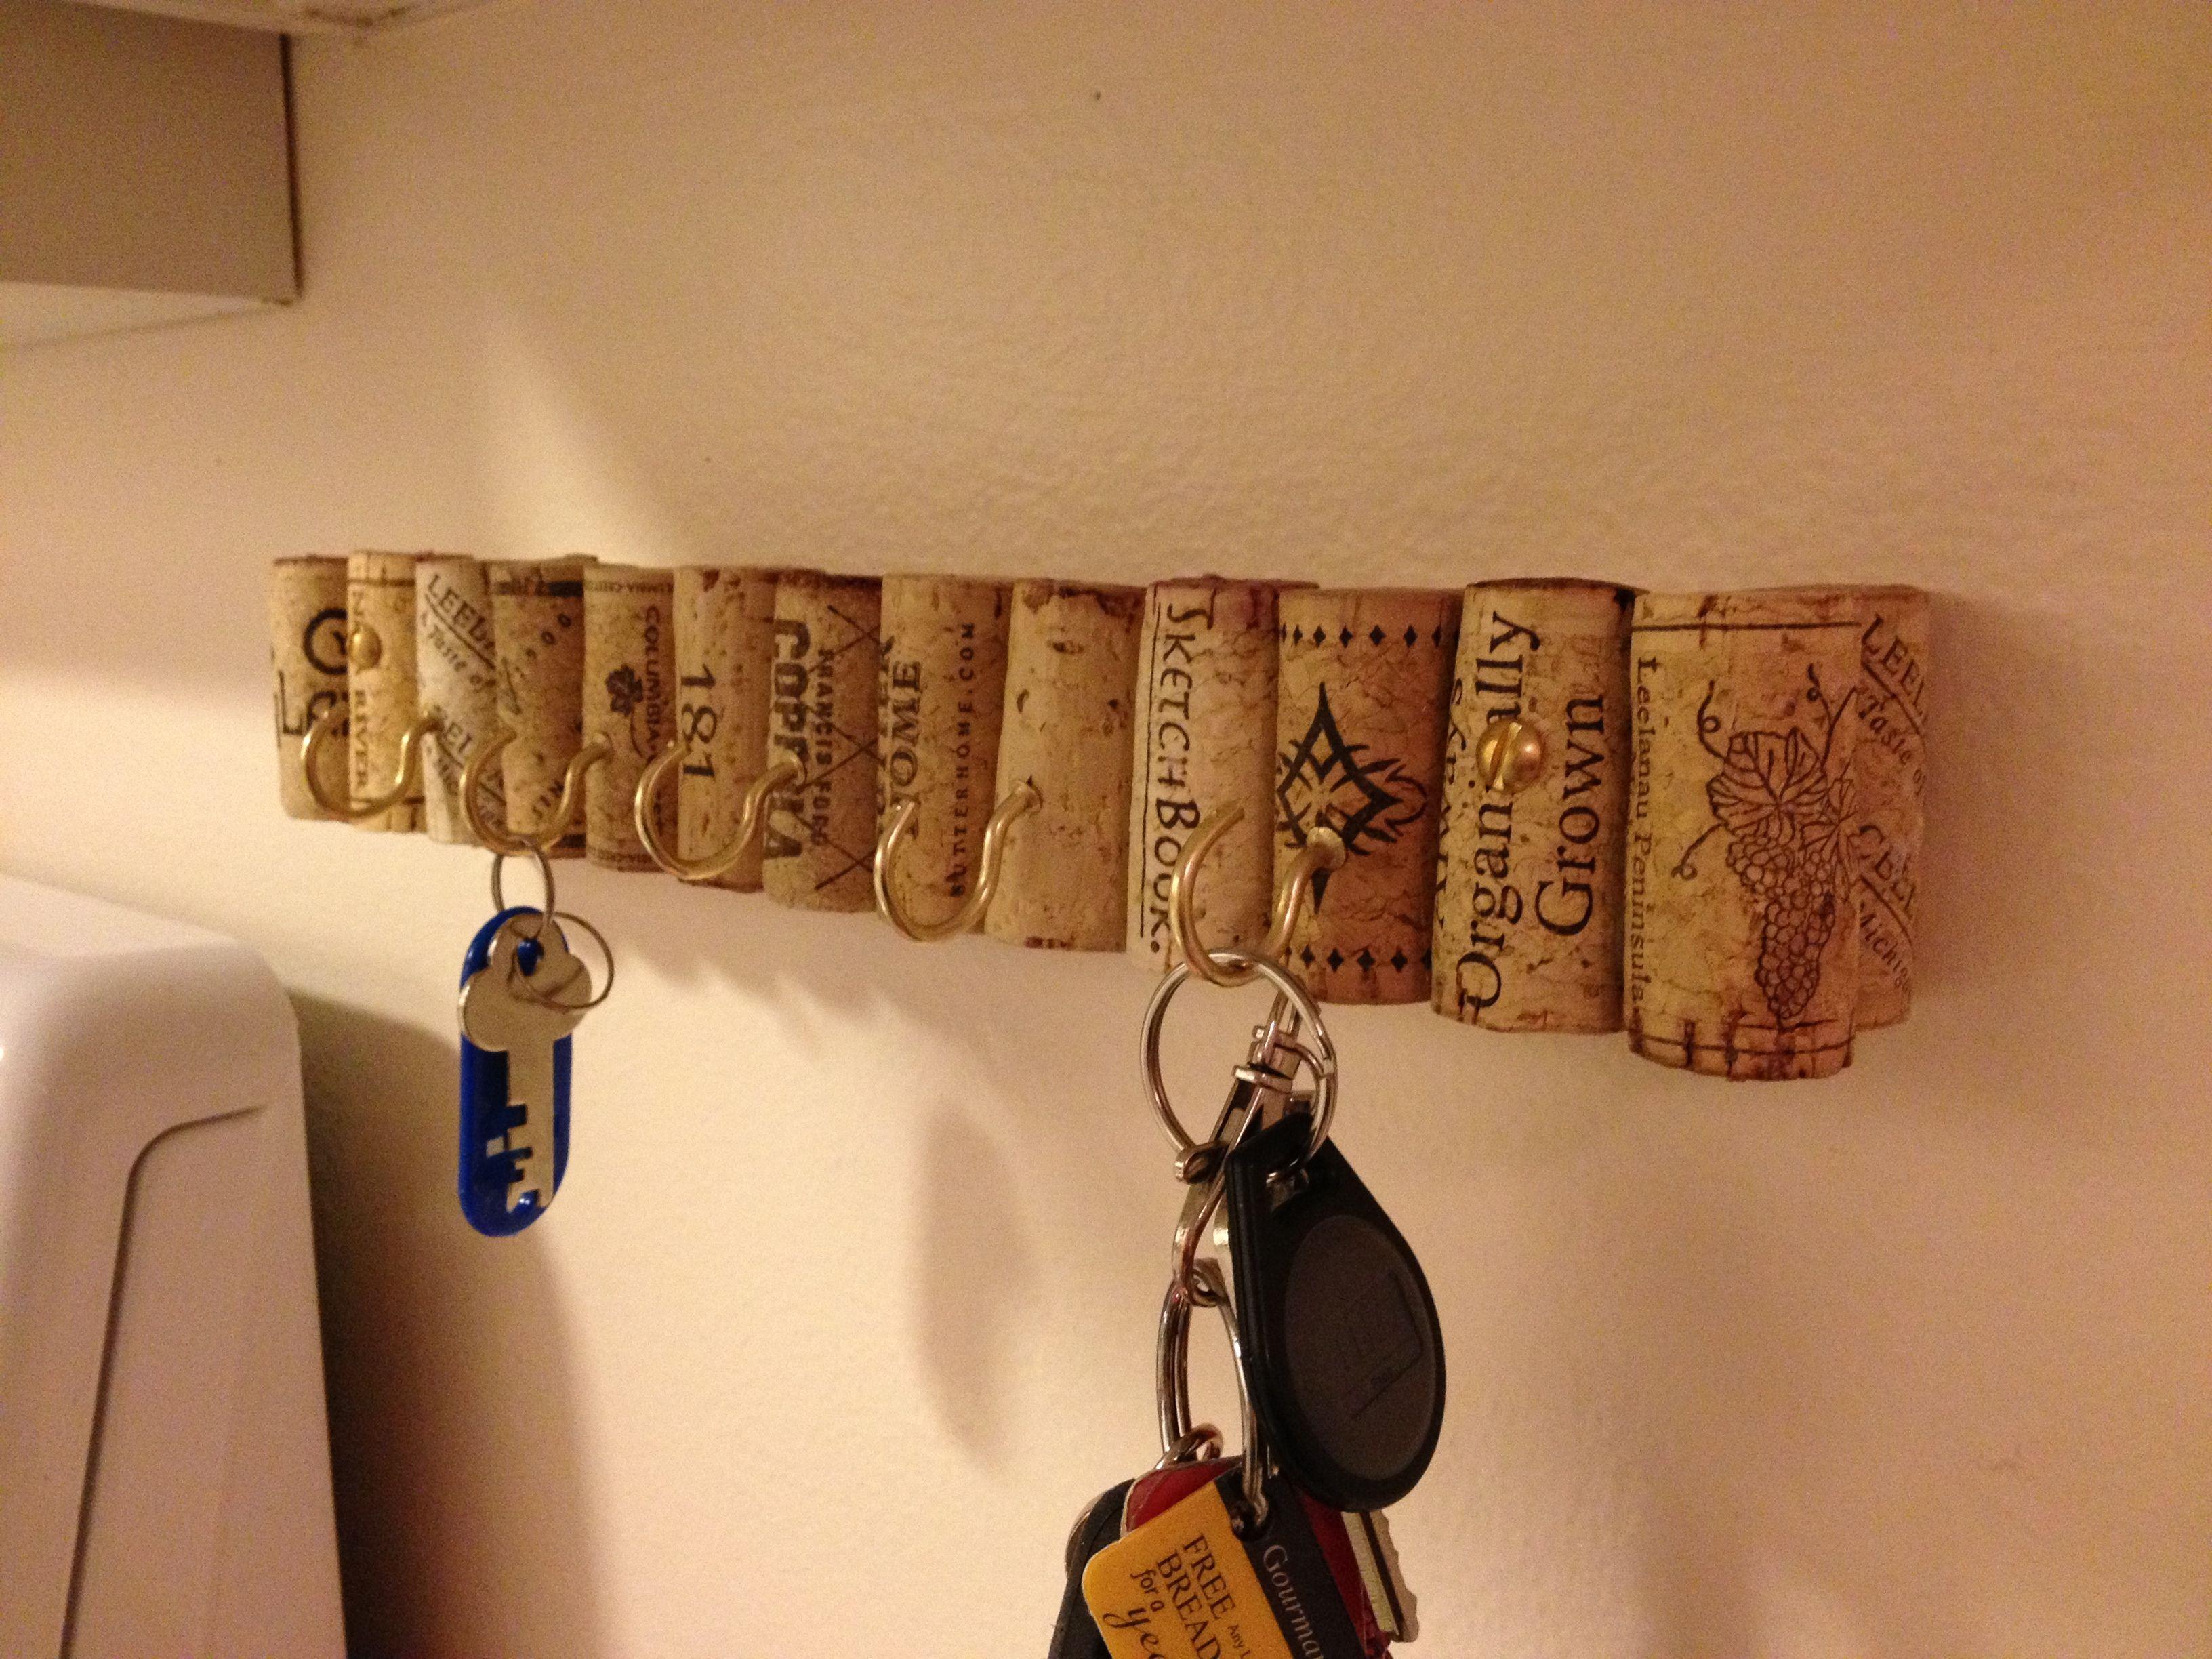 Diy Recycled Corks Key Rack Corks Wine Bottles